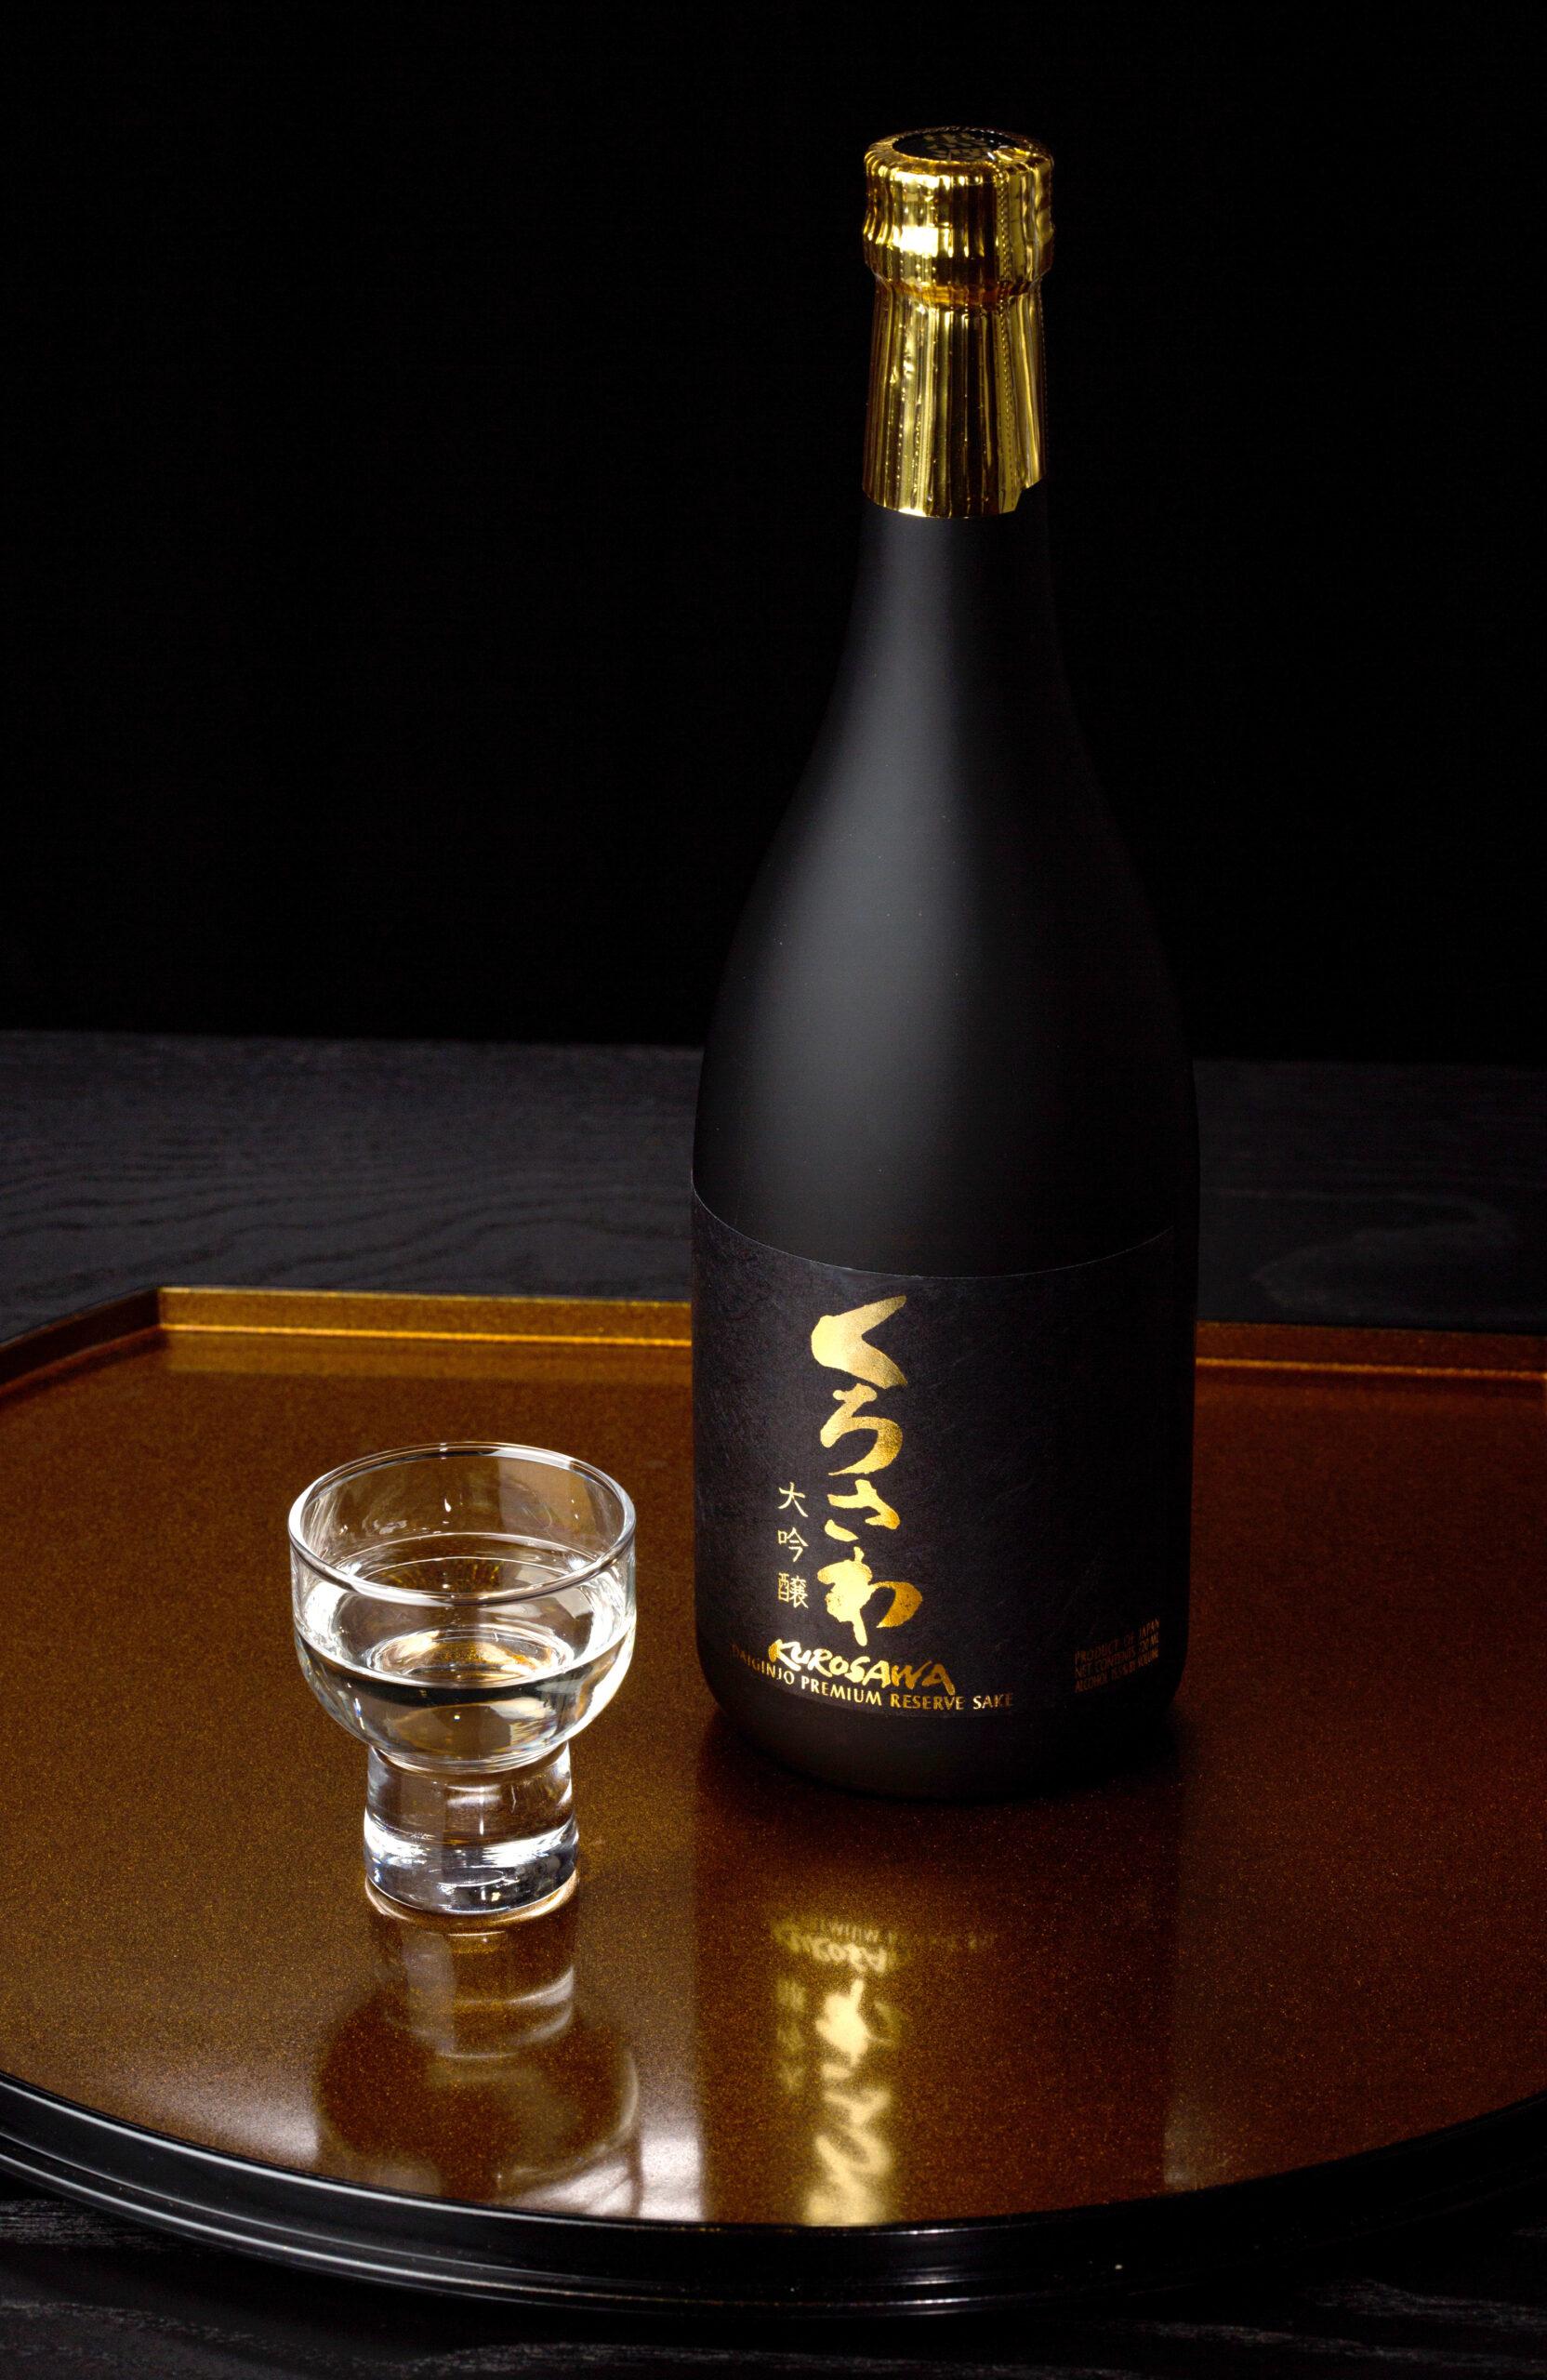 kurosawa_daiginjo_premium reserve bottle